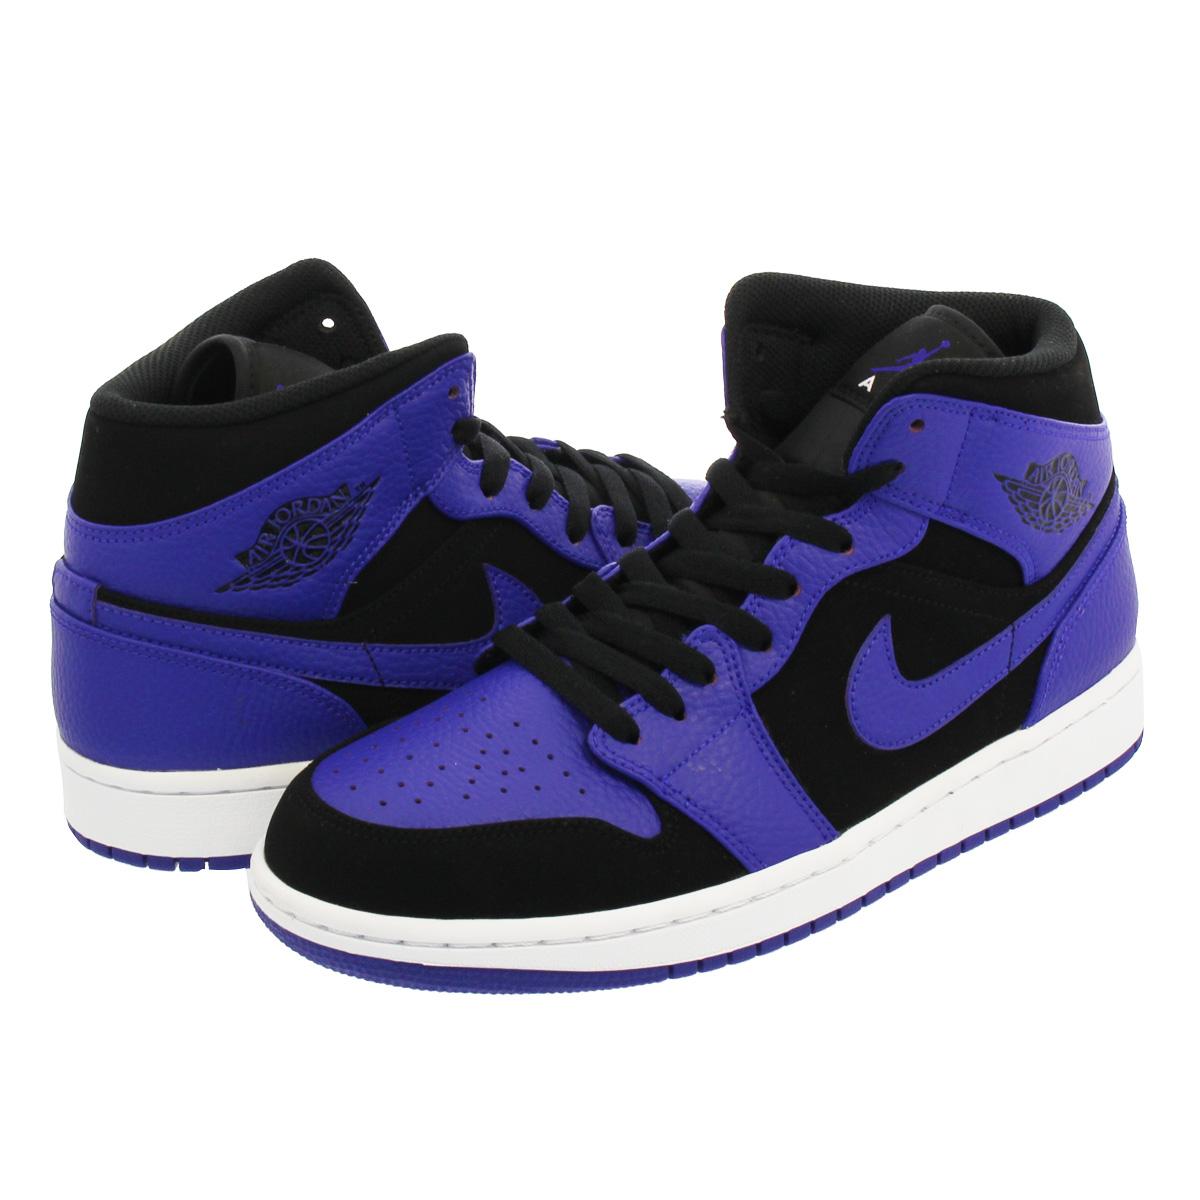 bddd84fad33f NIKE AIR JORDAN 1 MID Nike Air Jordan 1 mid BLACK DARK CONCORD WHITE 554